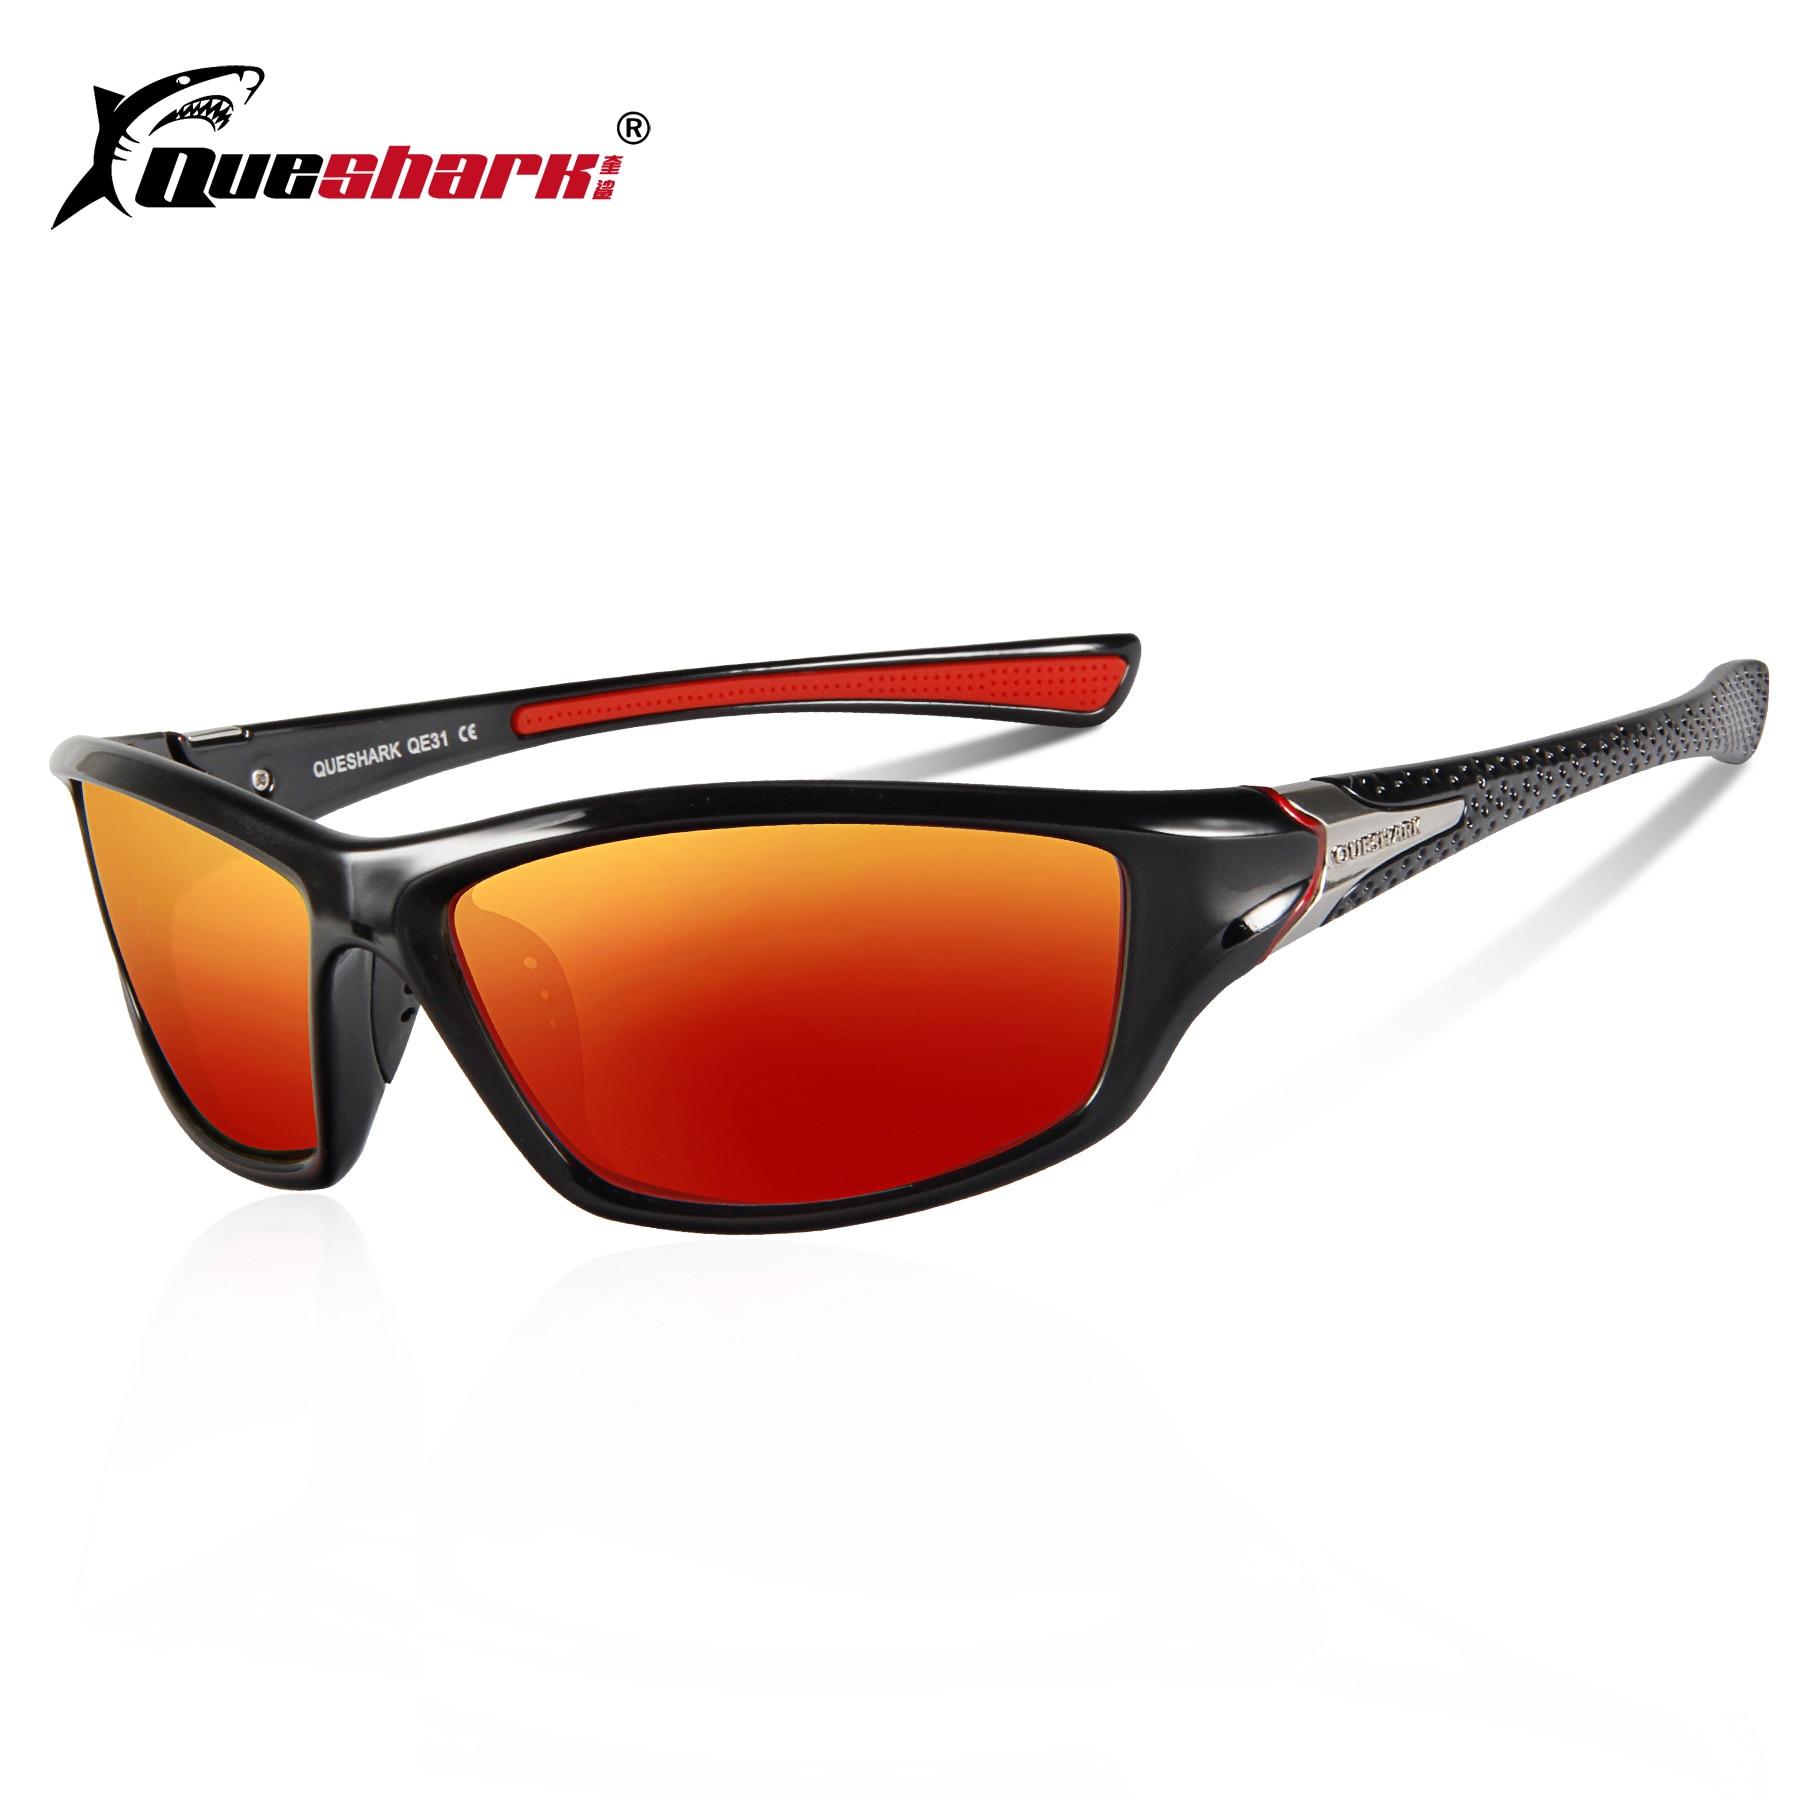 QUESHARK Polarized Cycling Eyewear Night Riding Yellow Lens Uv Protection Bicycle Sunglasses Unisex Driving Hiking Sports Glasse